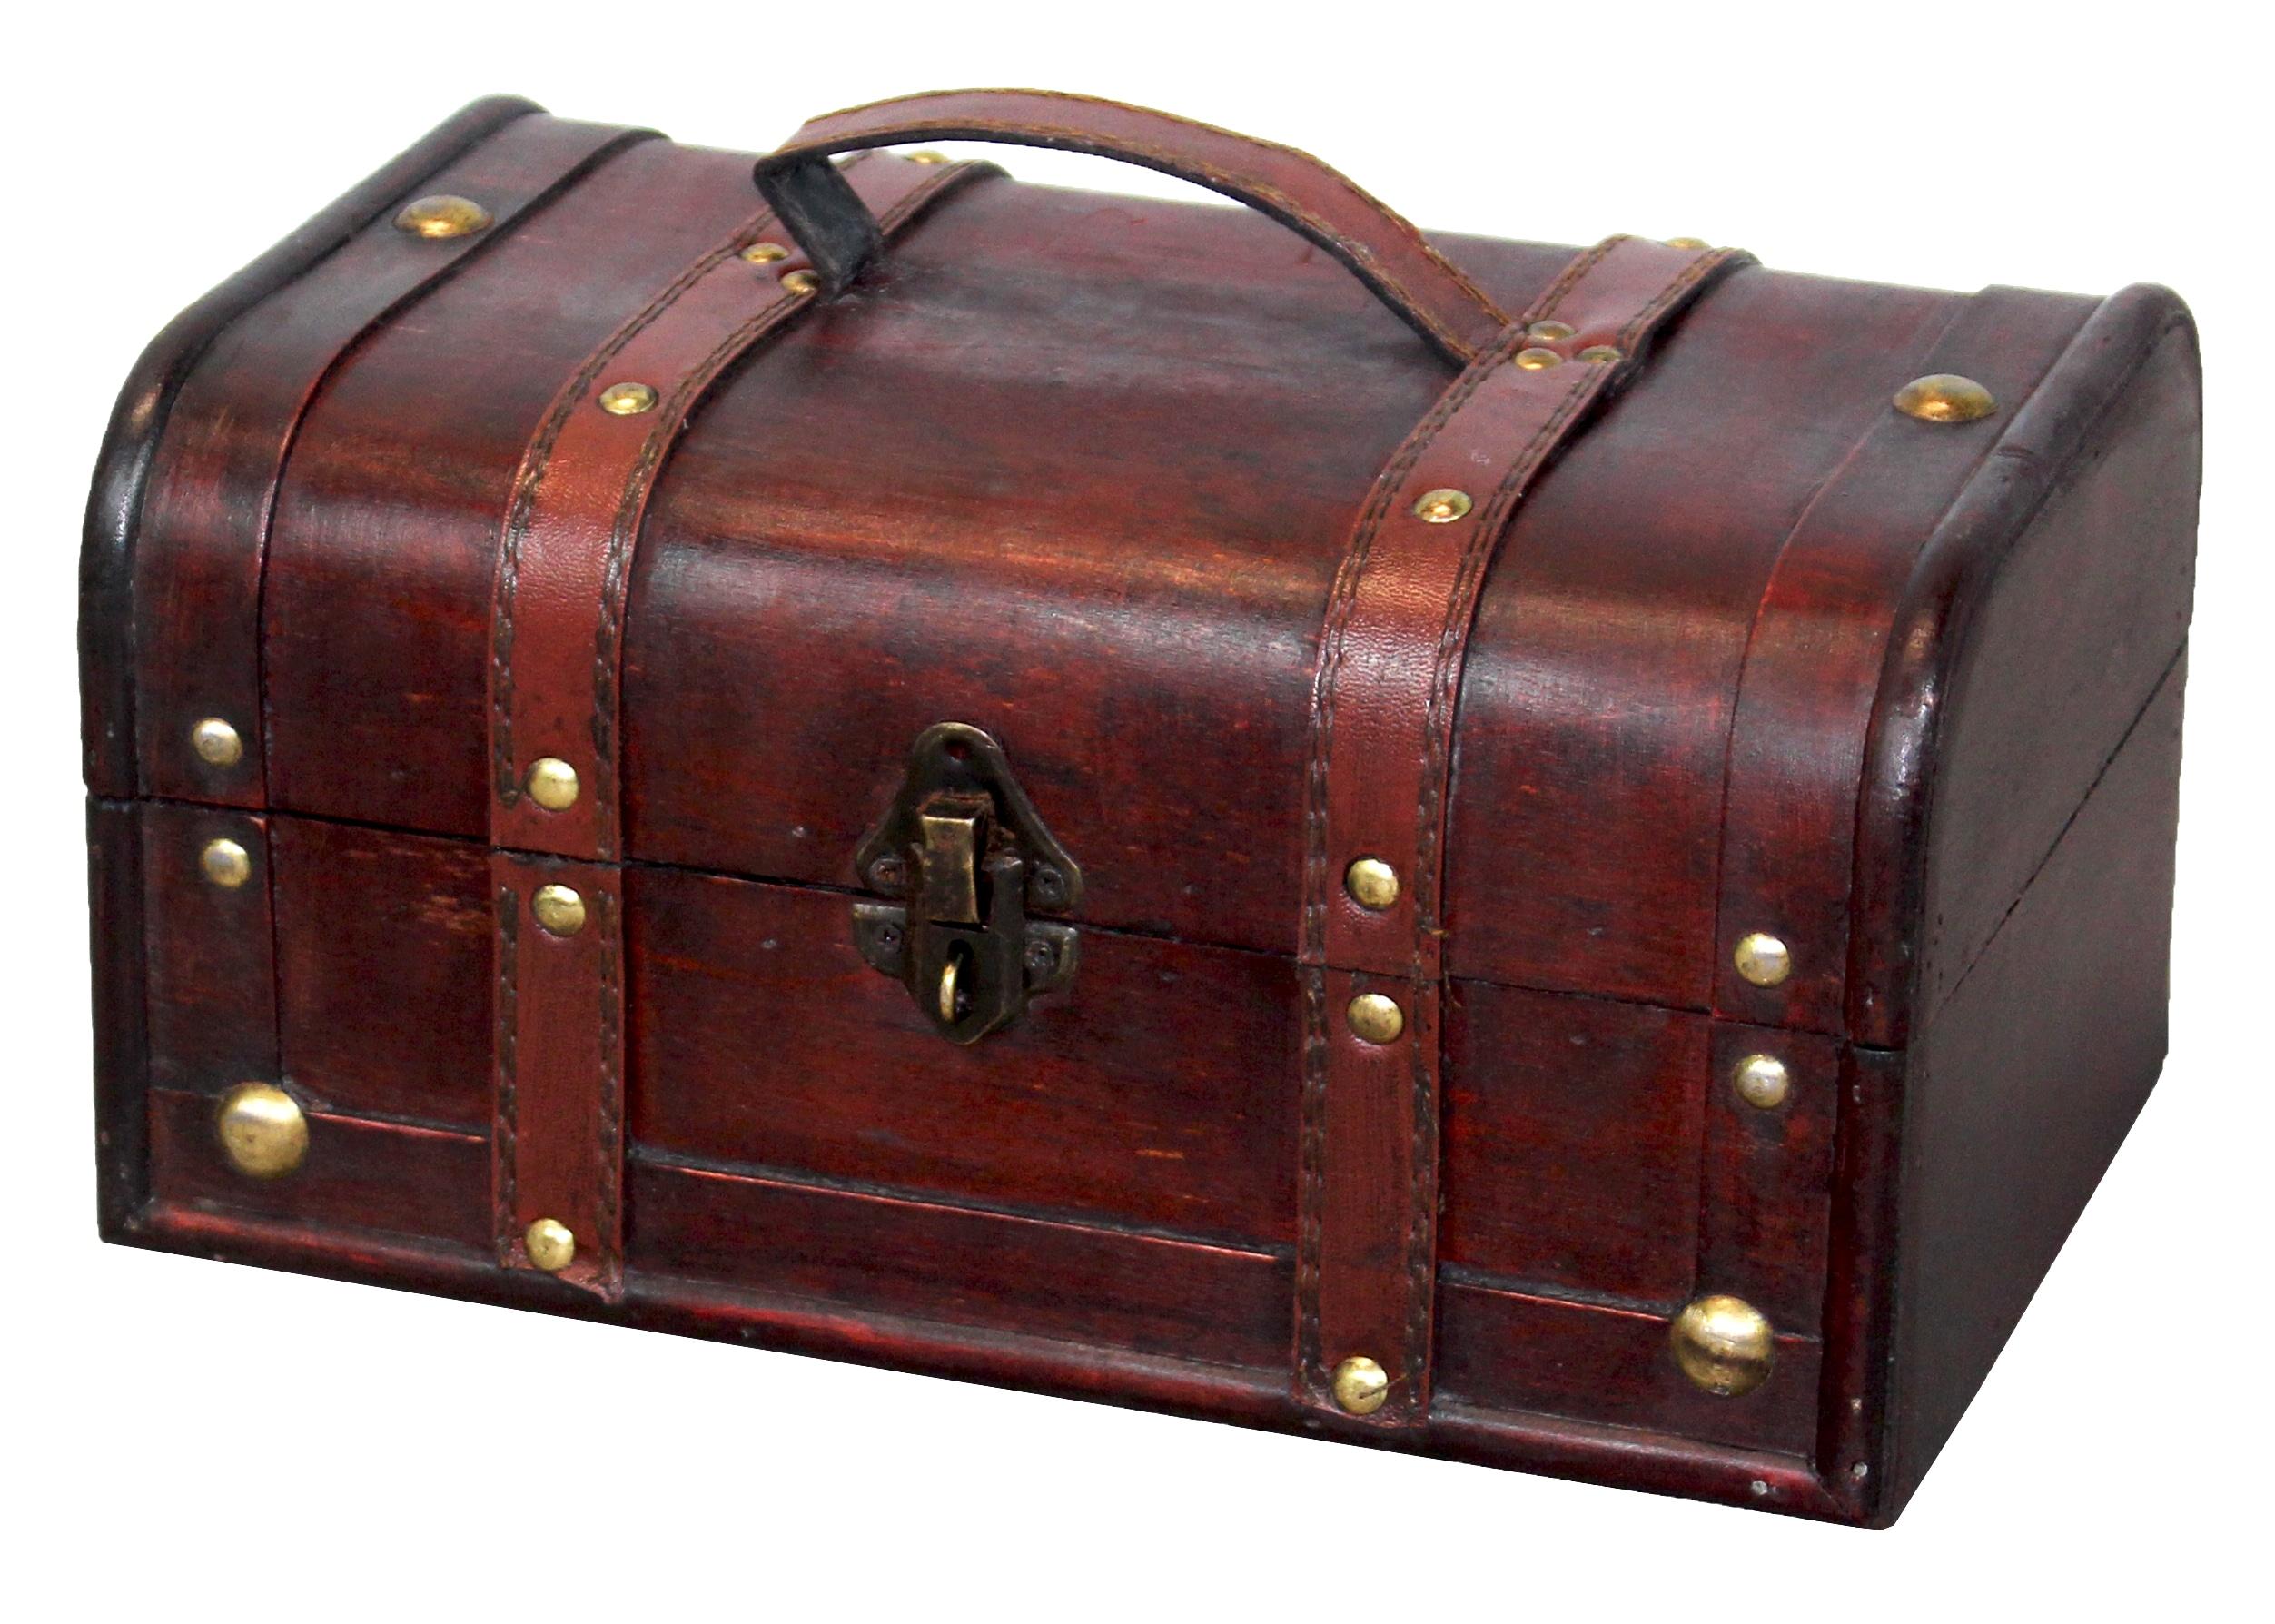 Decorative Wood Trunk-style Treasure Box